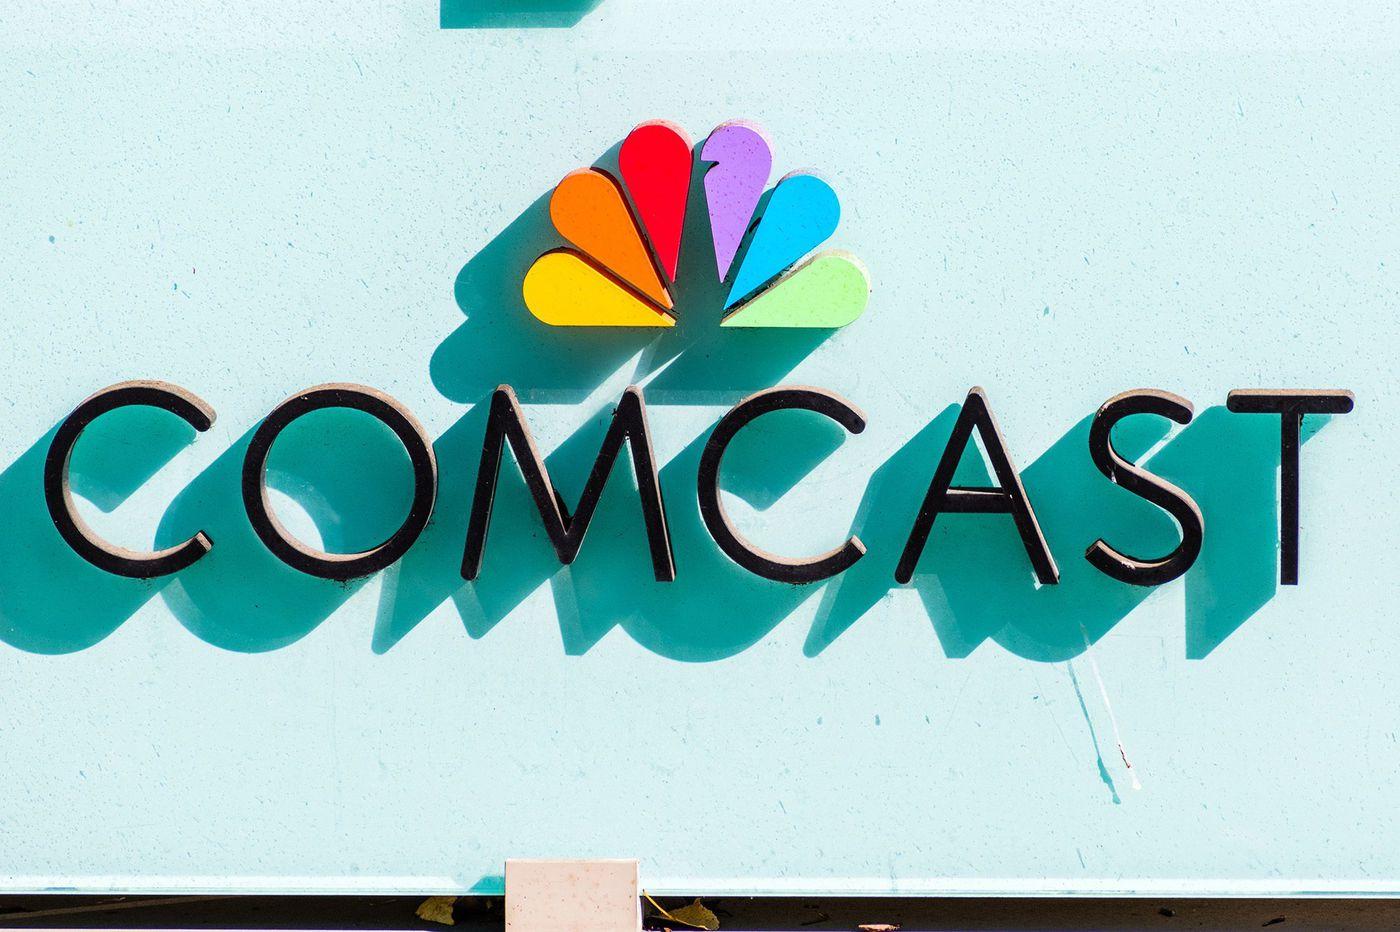 New internet customers boost Comcast's 4th-quarter profit